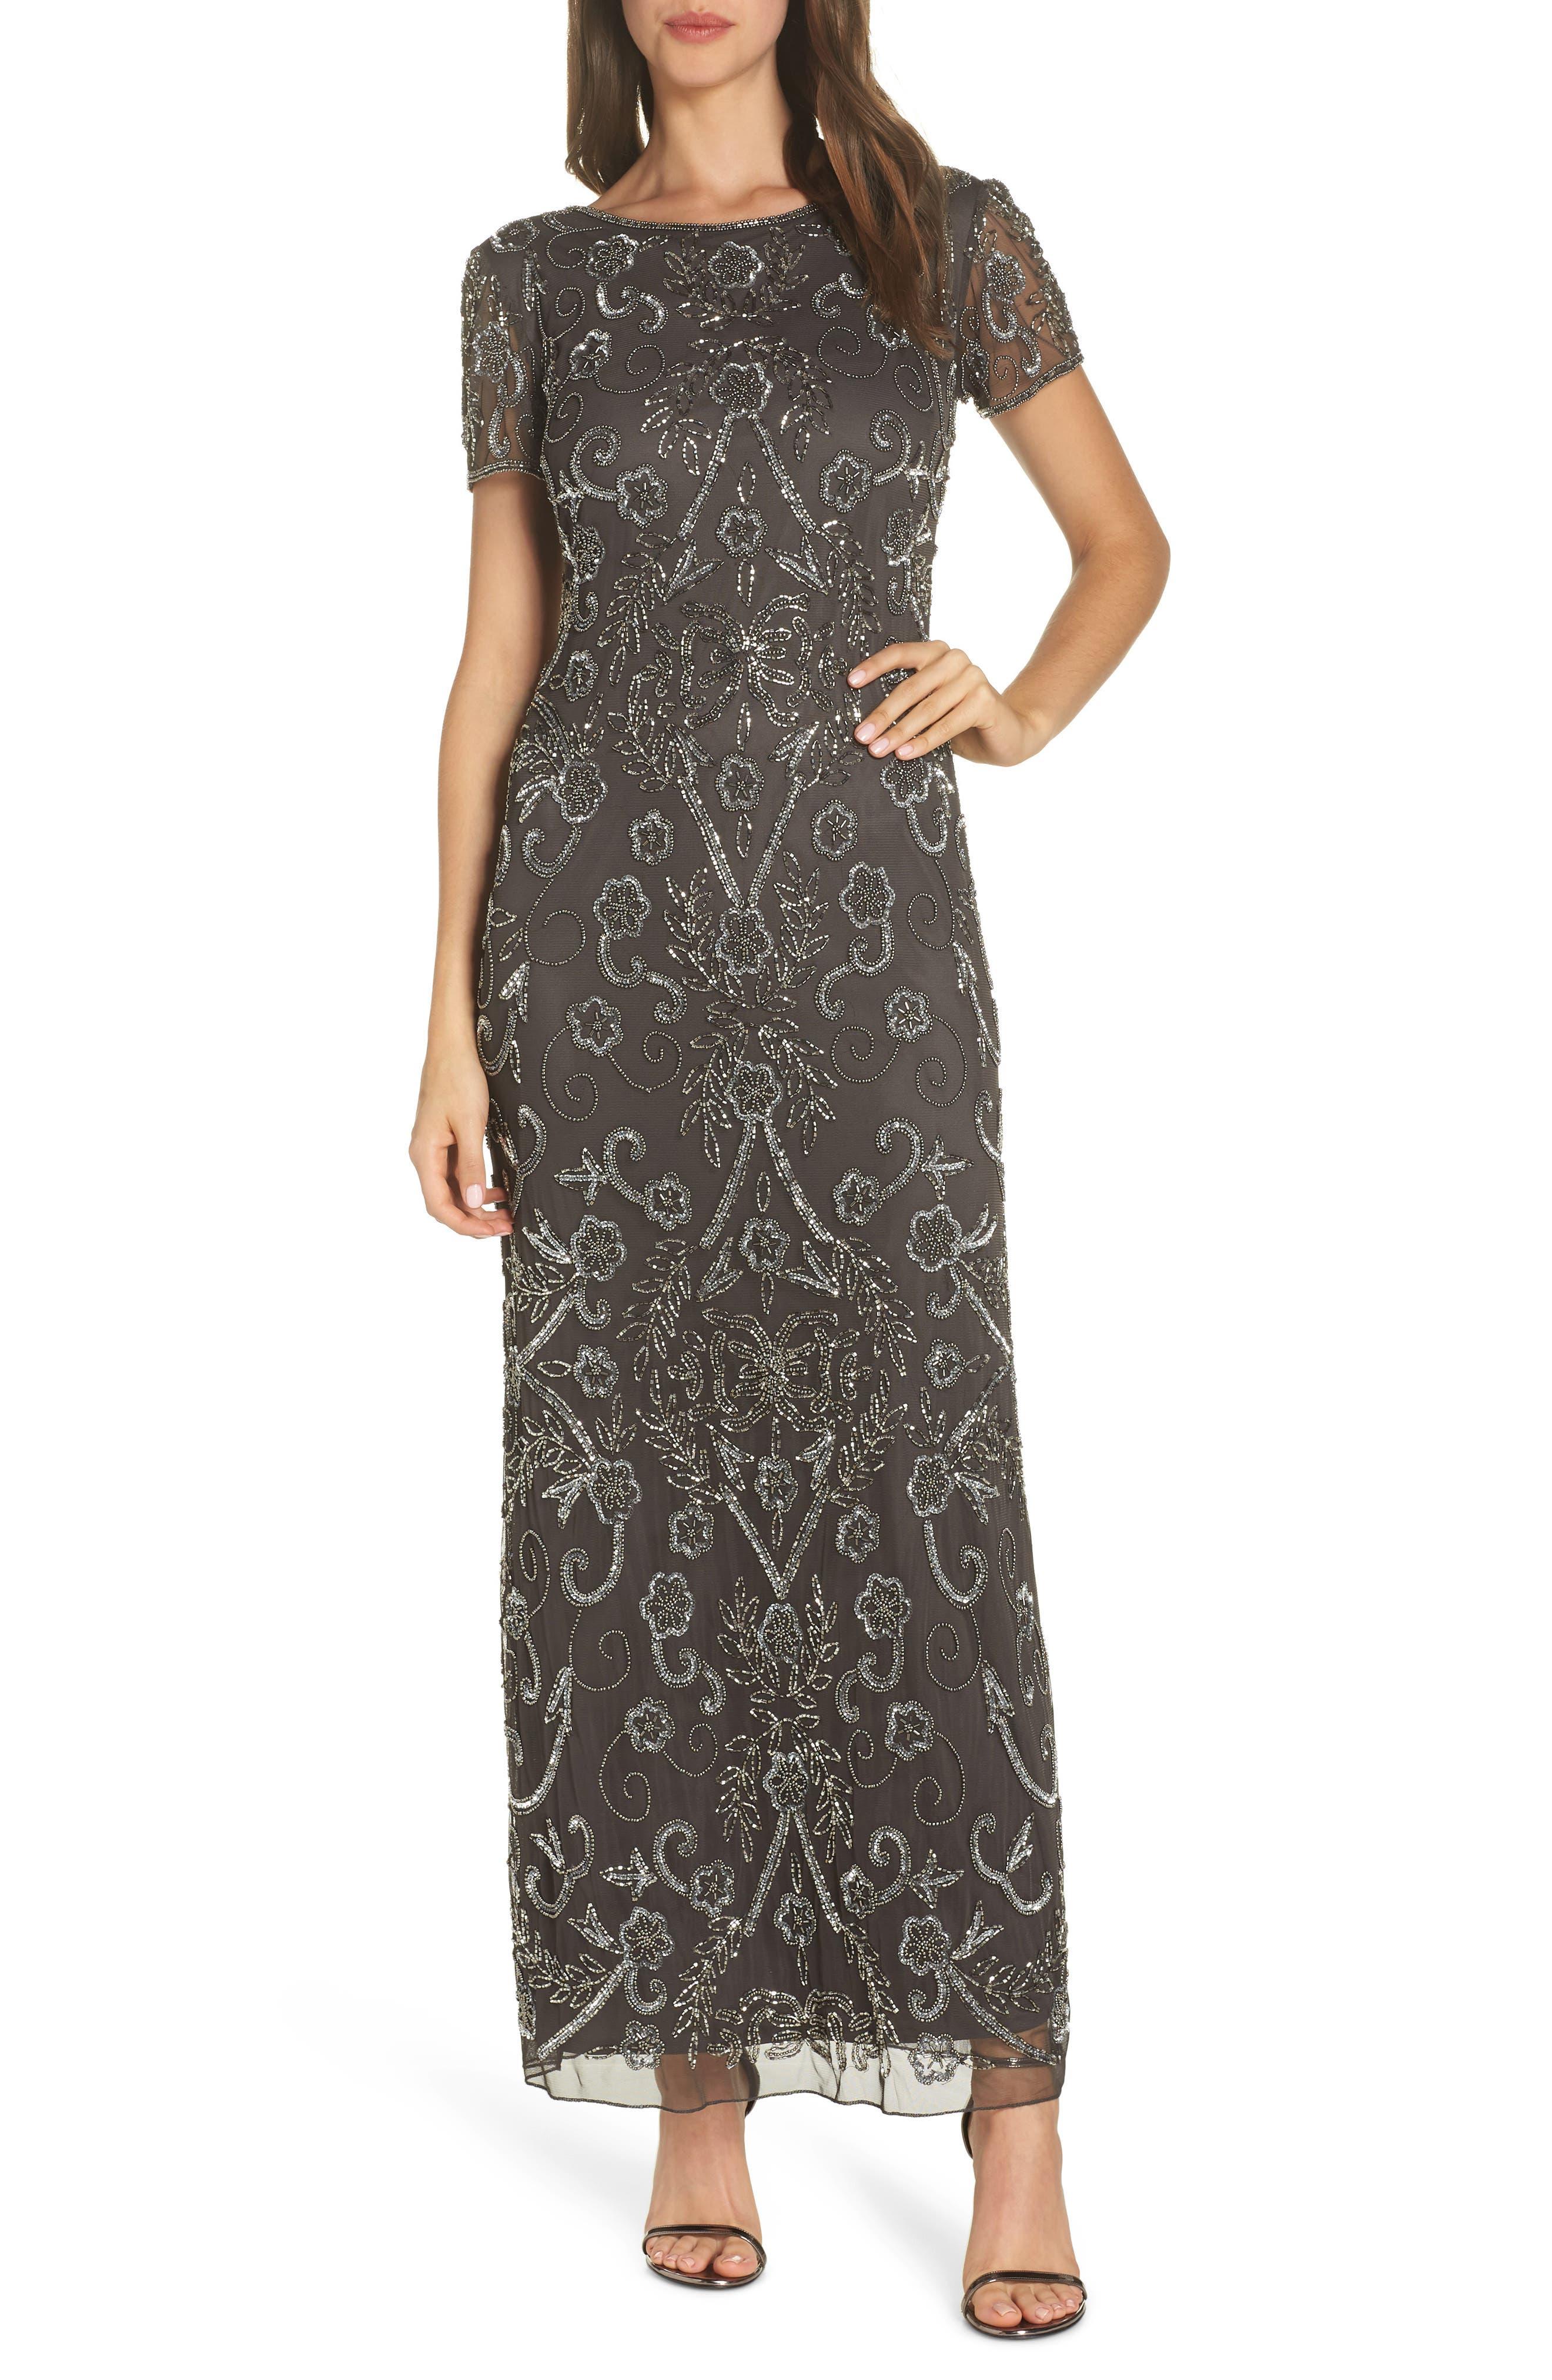 PISARRO NIGHTS, Embellished Mesh Evening Dress, Main thumbnail 1, color, SLIVER / GREY